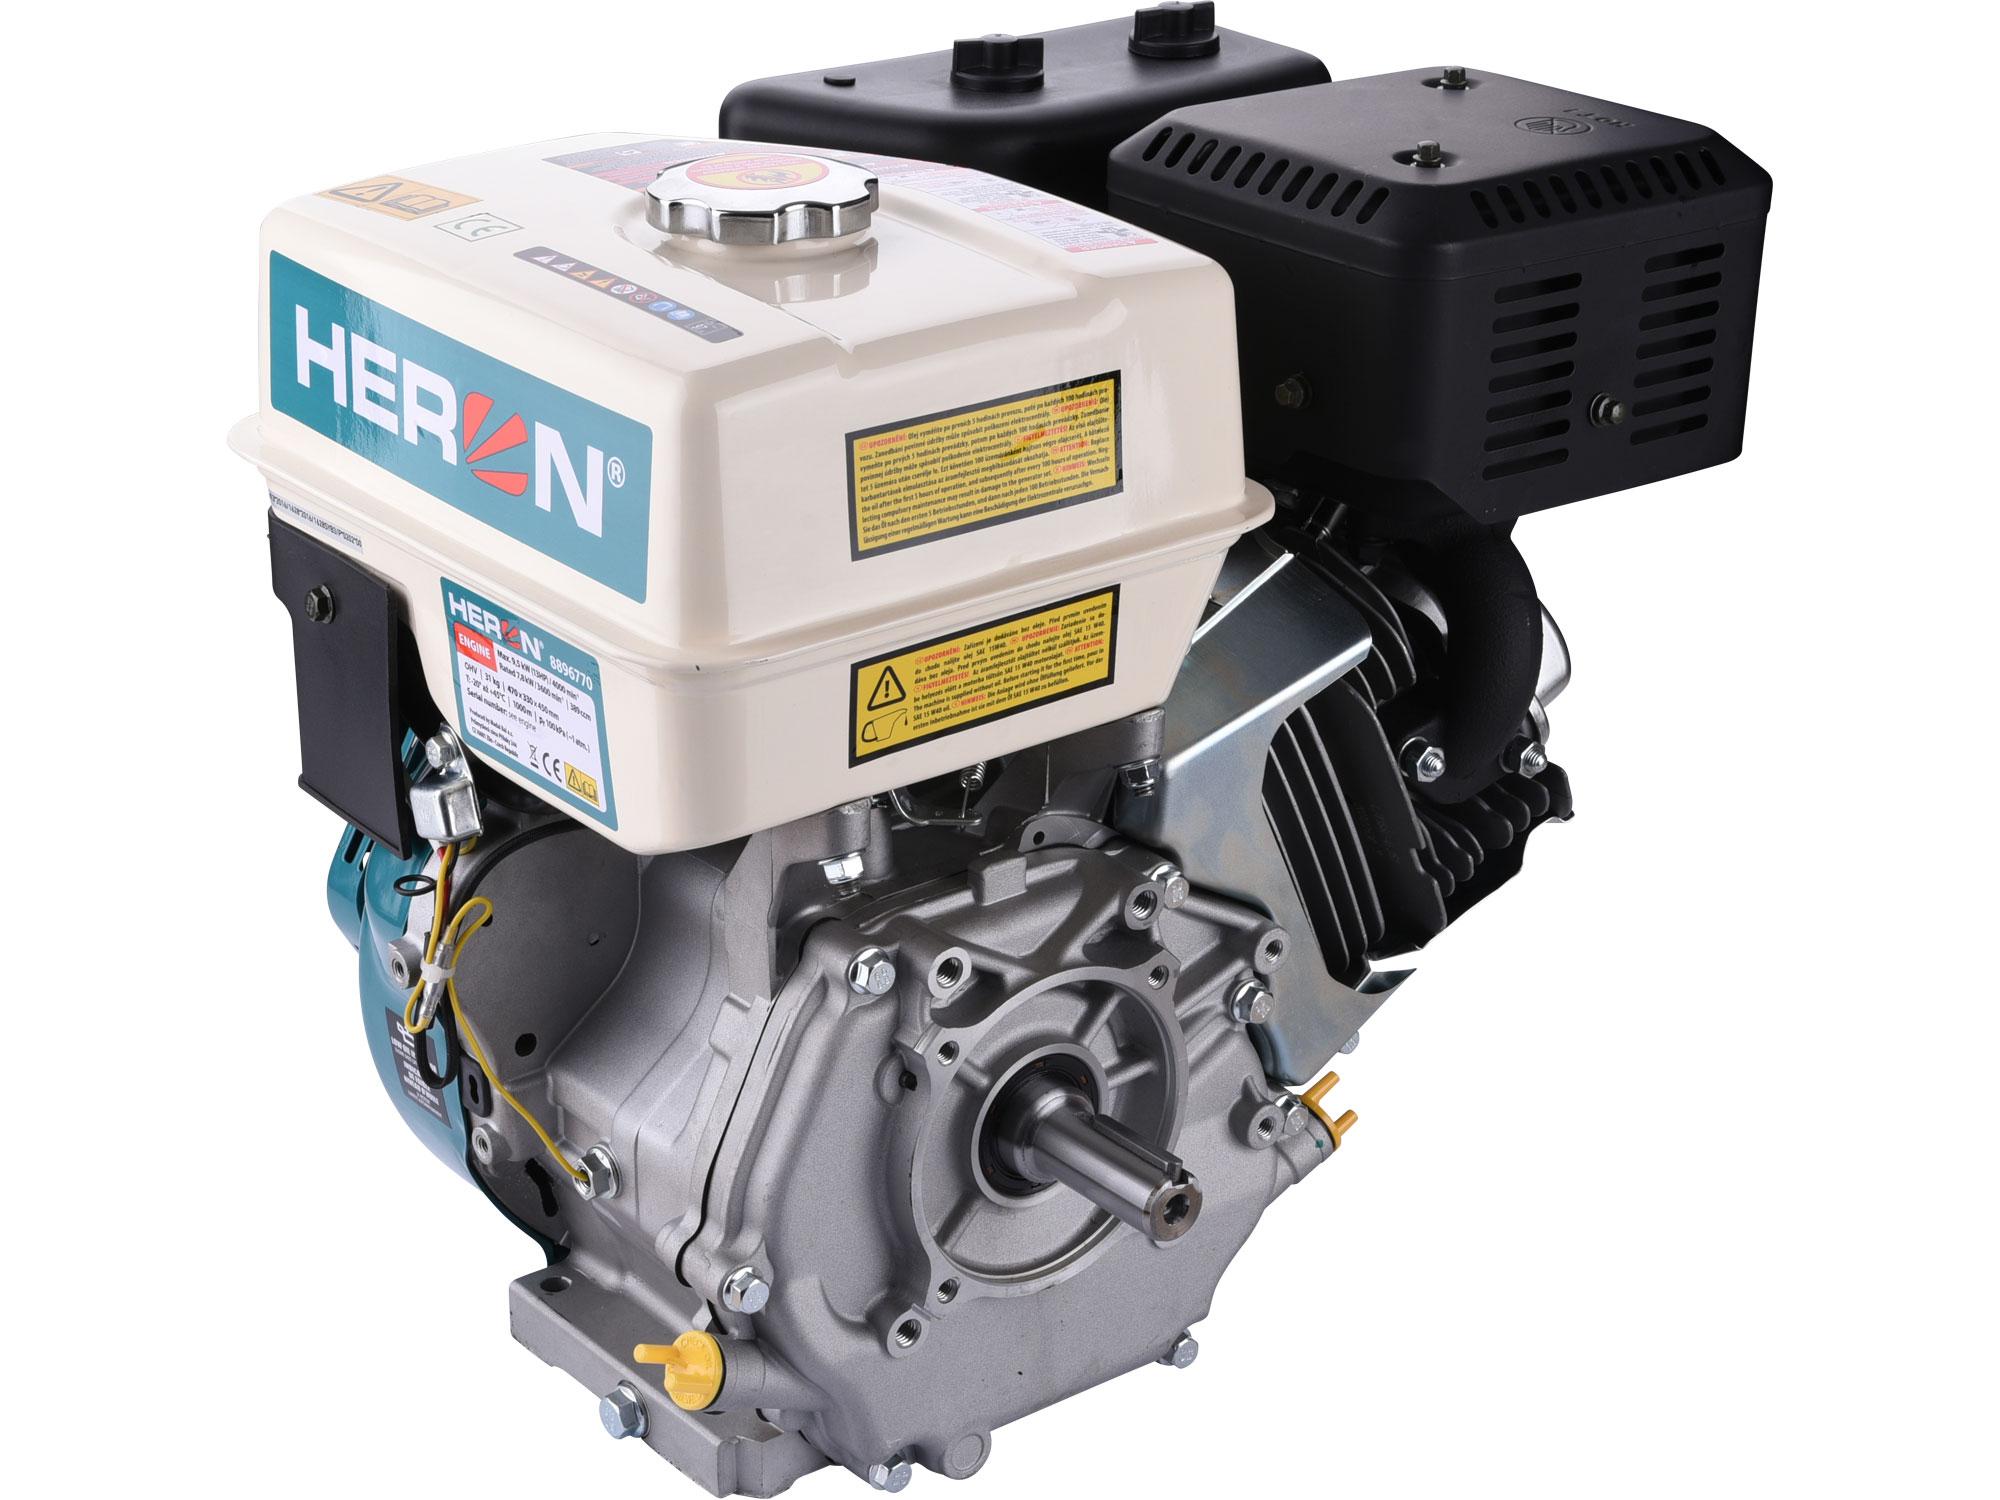 motor samostatný, 389ccm, 13HP